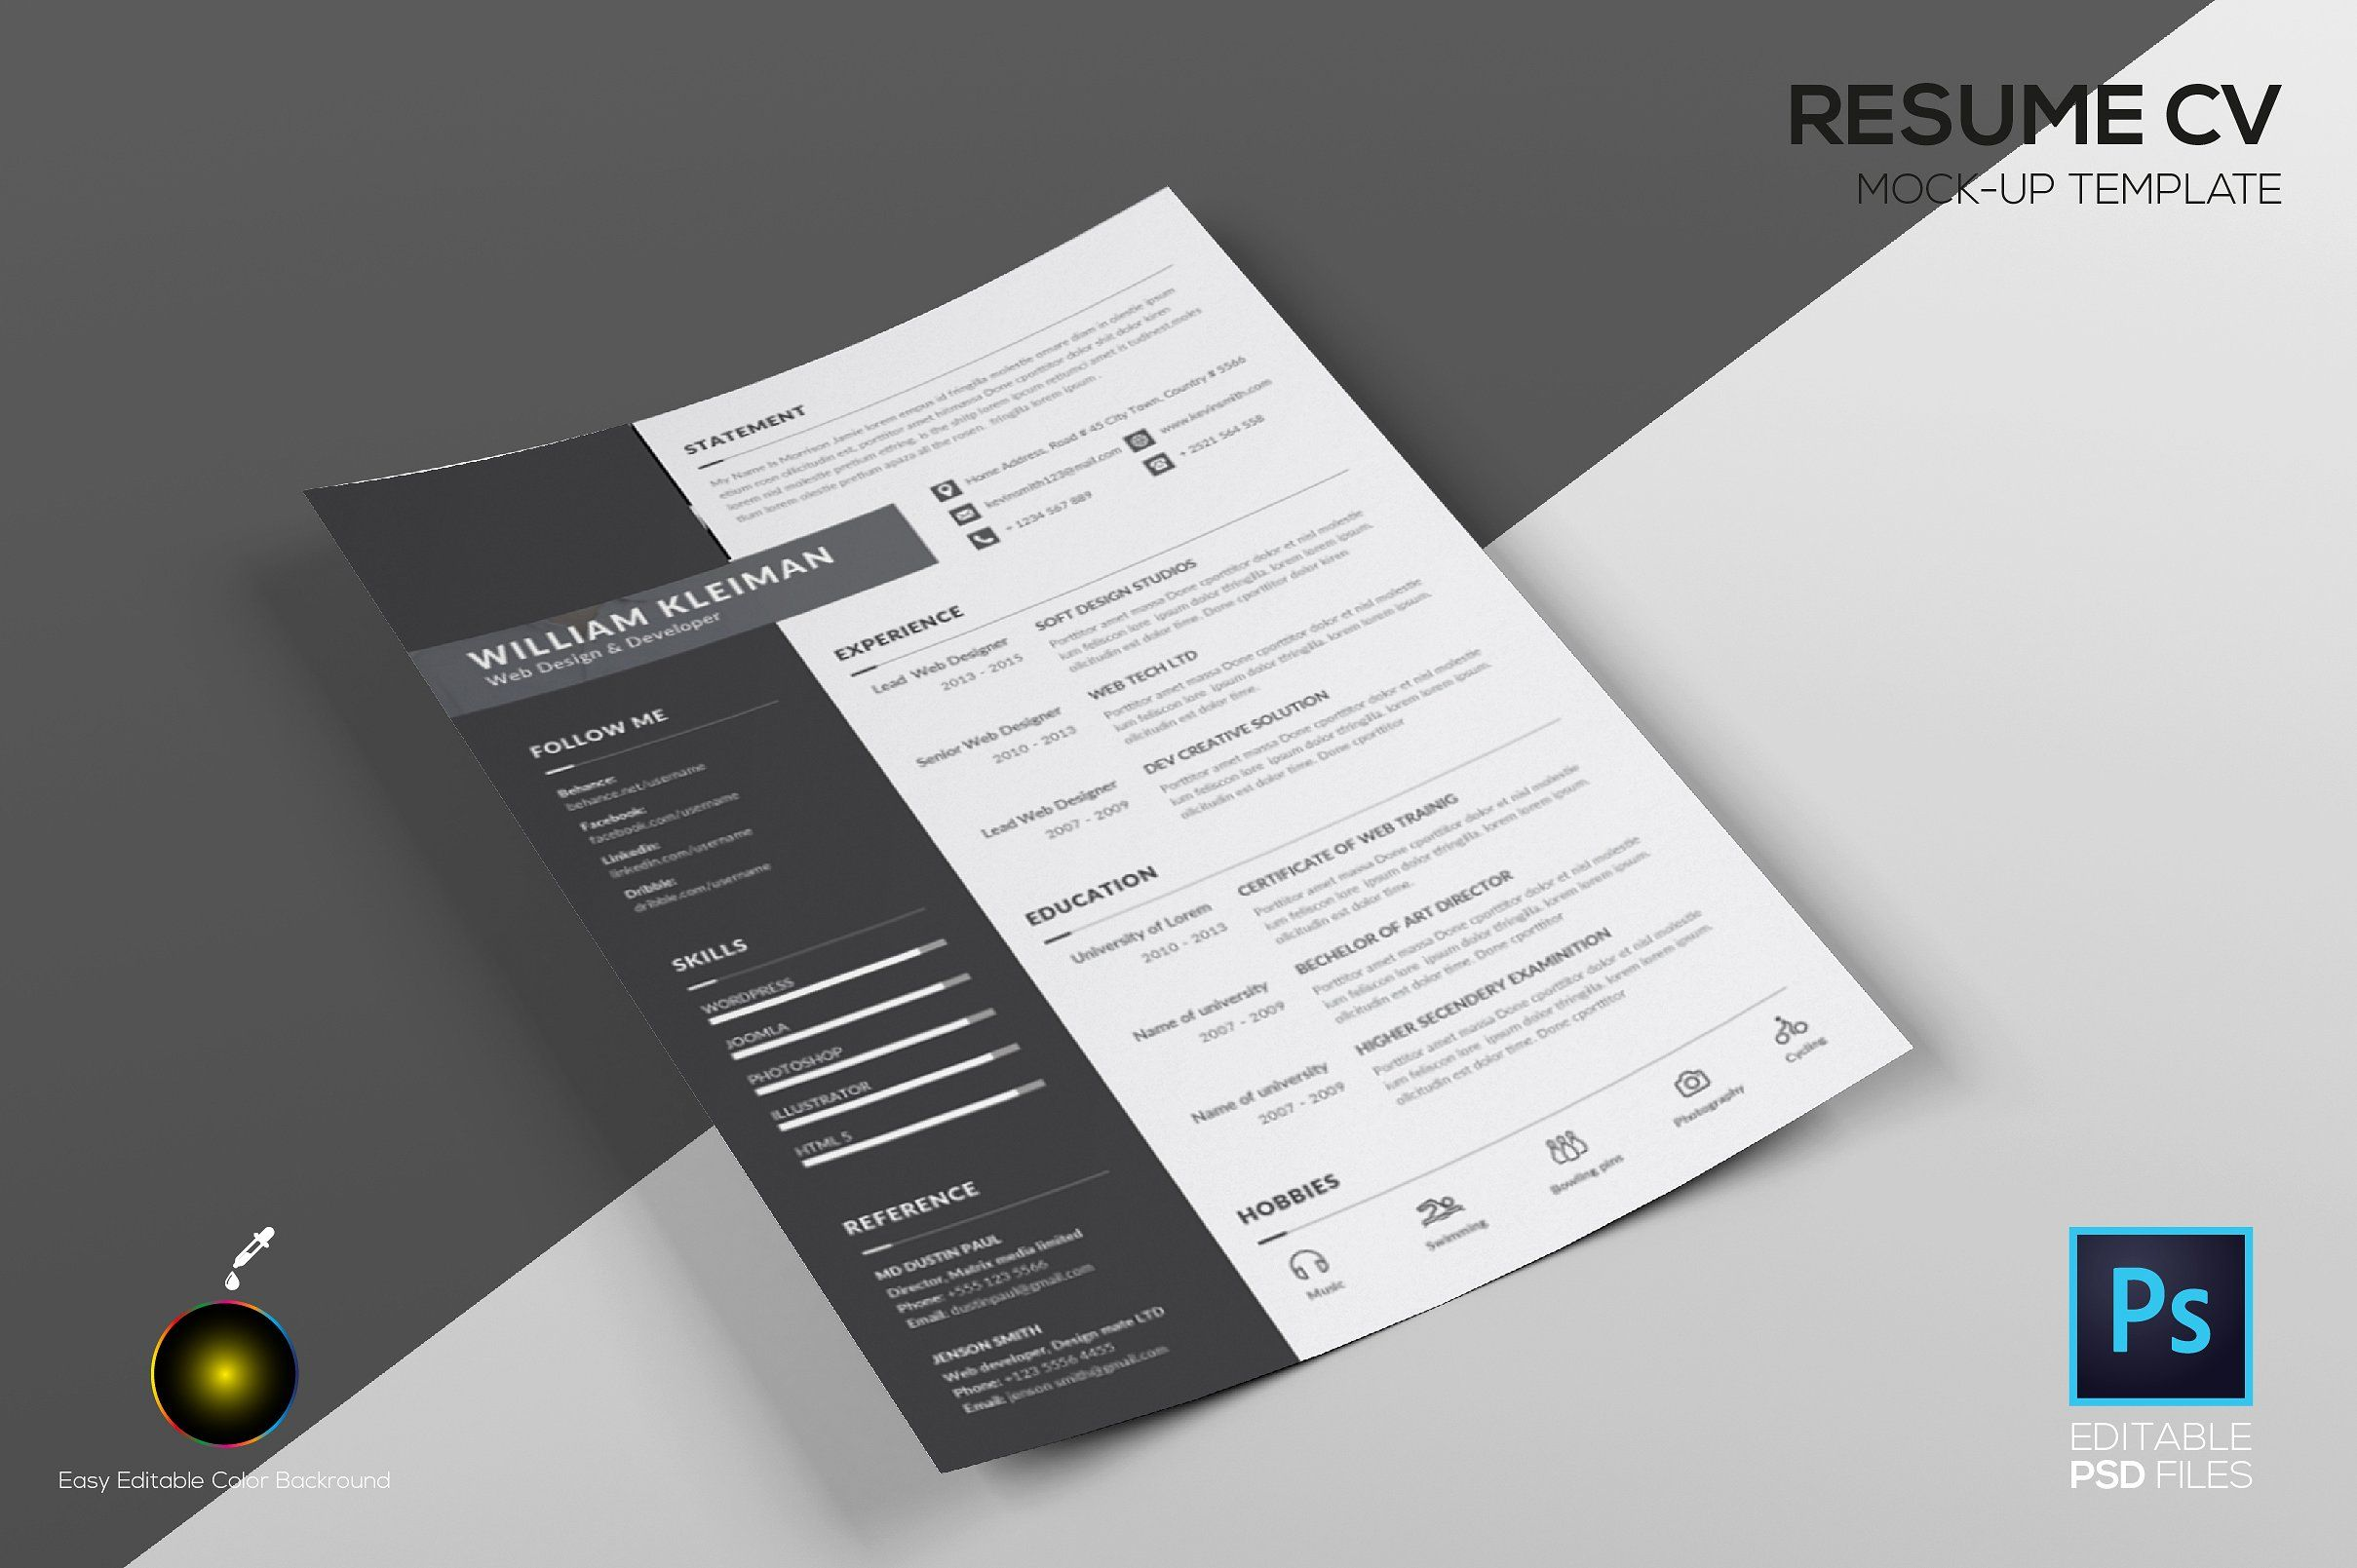 Resume CV Mock up Template by mockupteam on